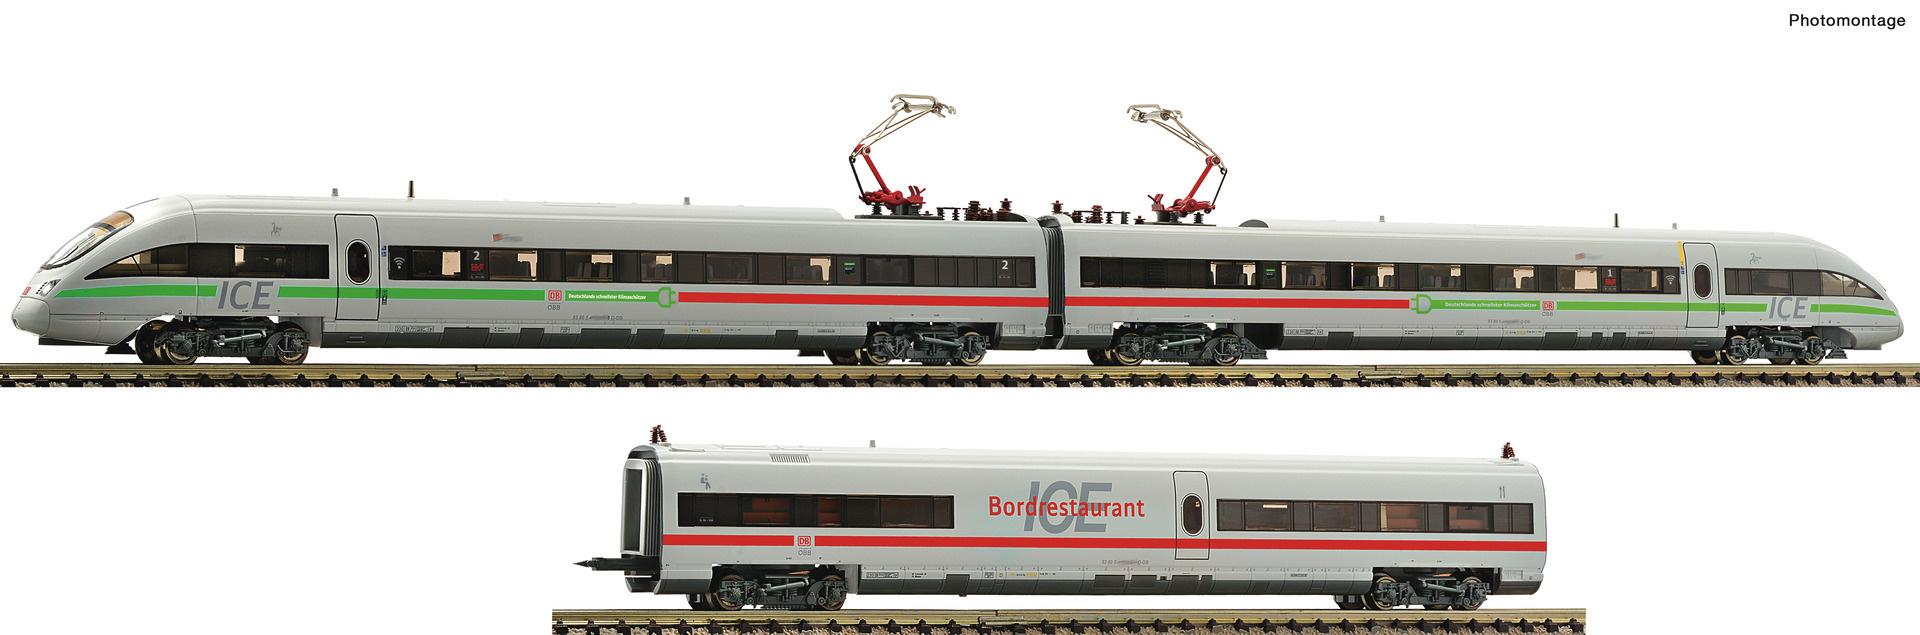 746002 ICE-T 3-tl. DB AG-1